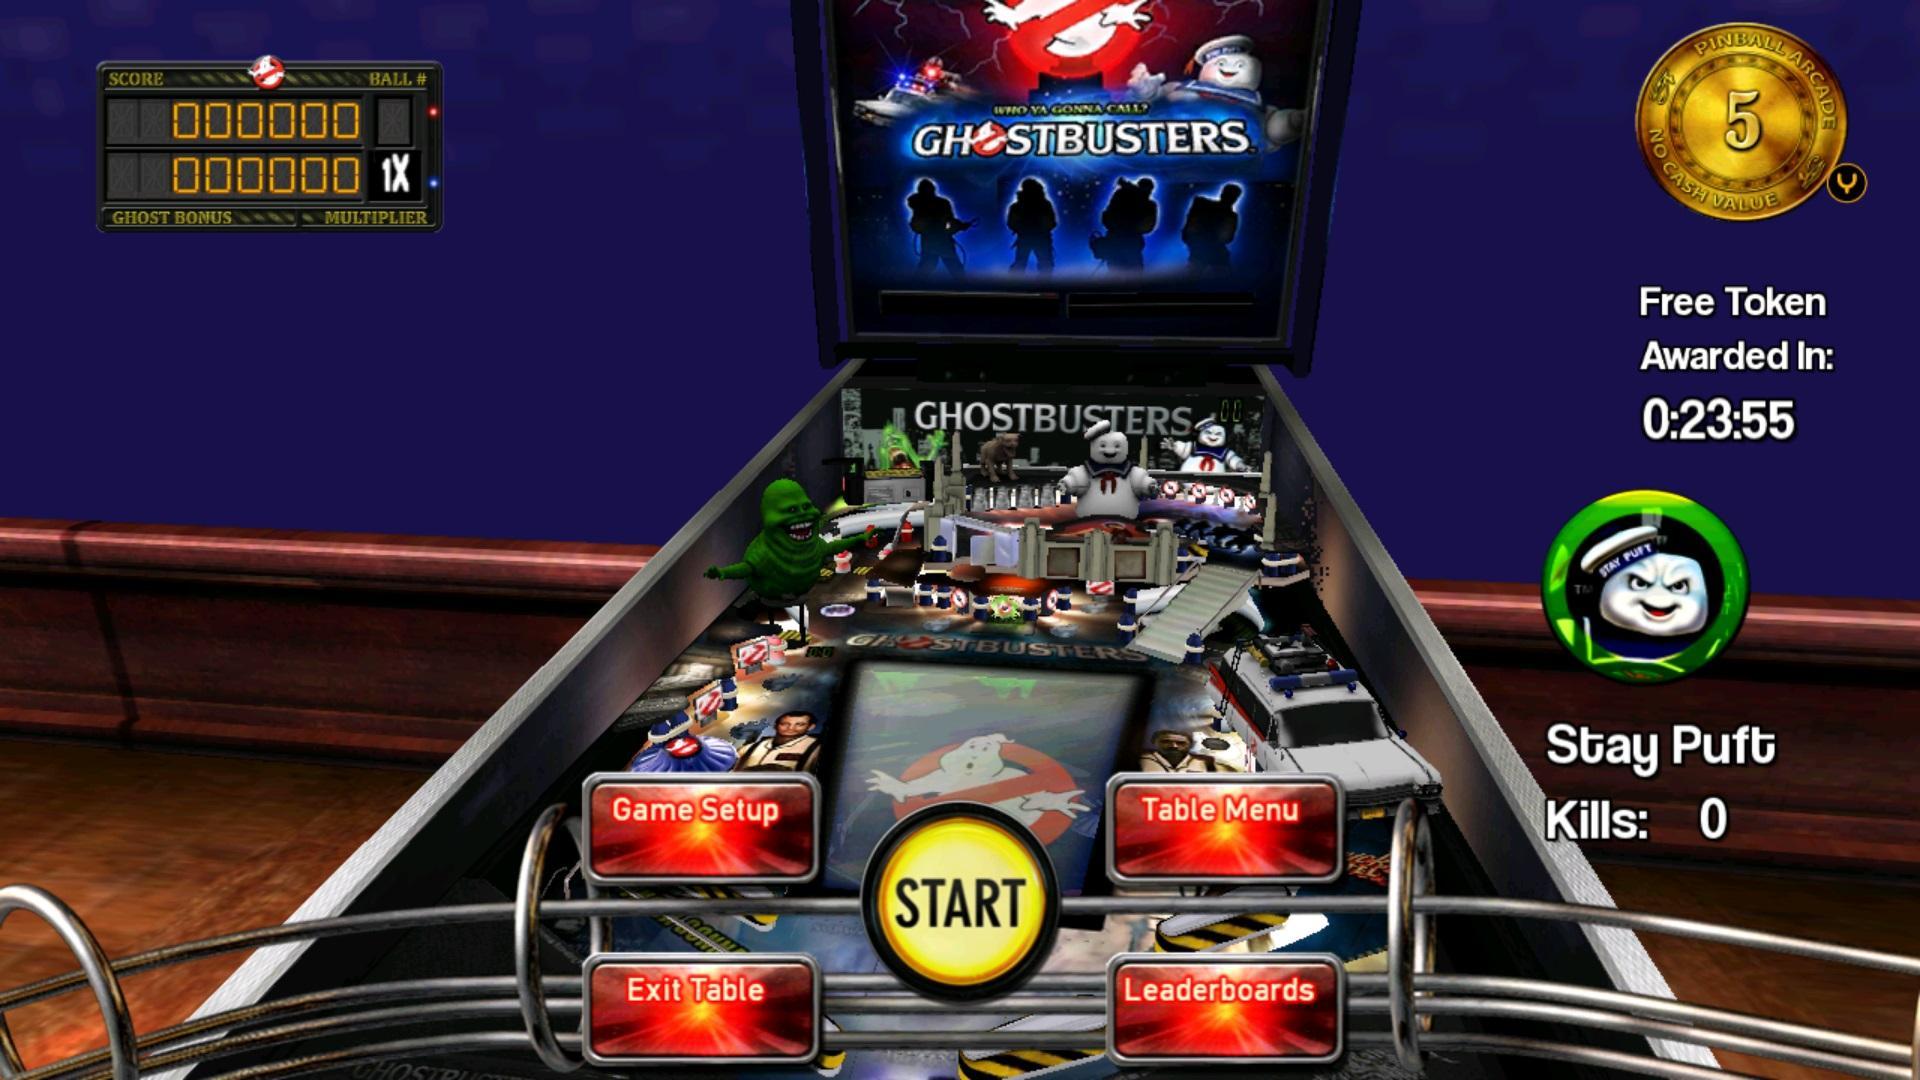 Screenshot of Ghostbusters Pinball